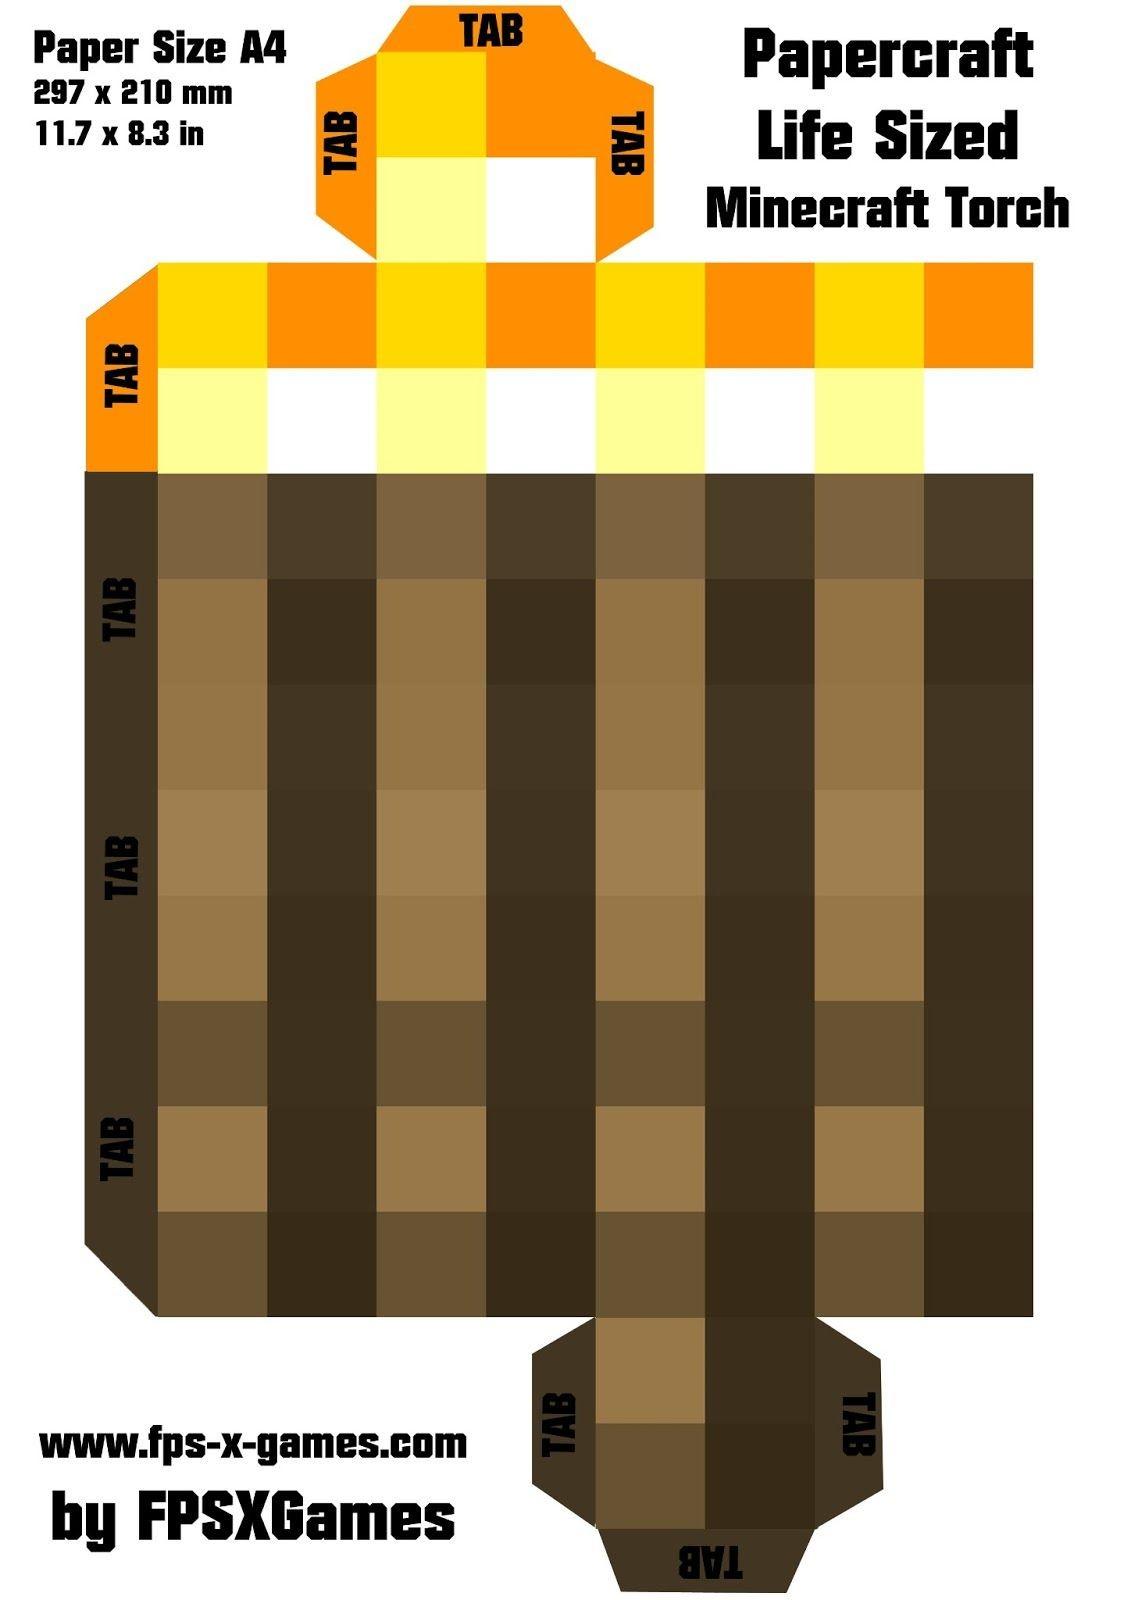 Papercraft Minecraft House Artesanato De Minecraft Passo A Passo – tocha Molde